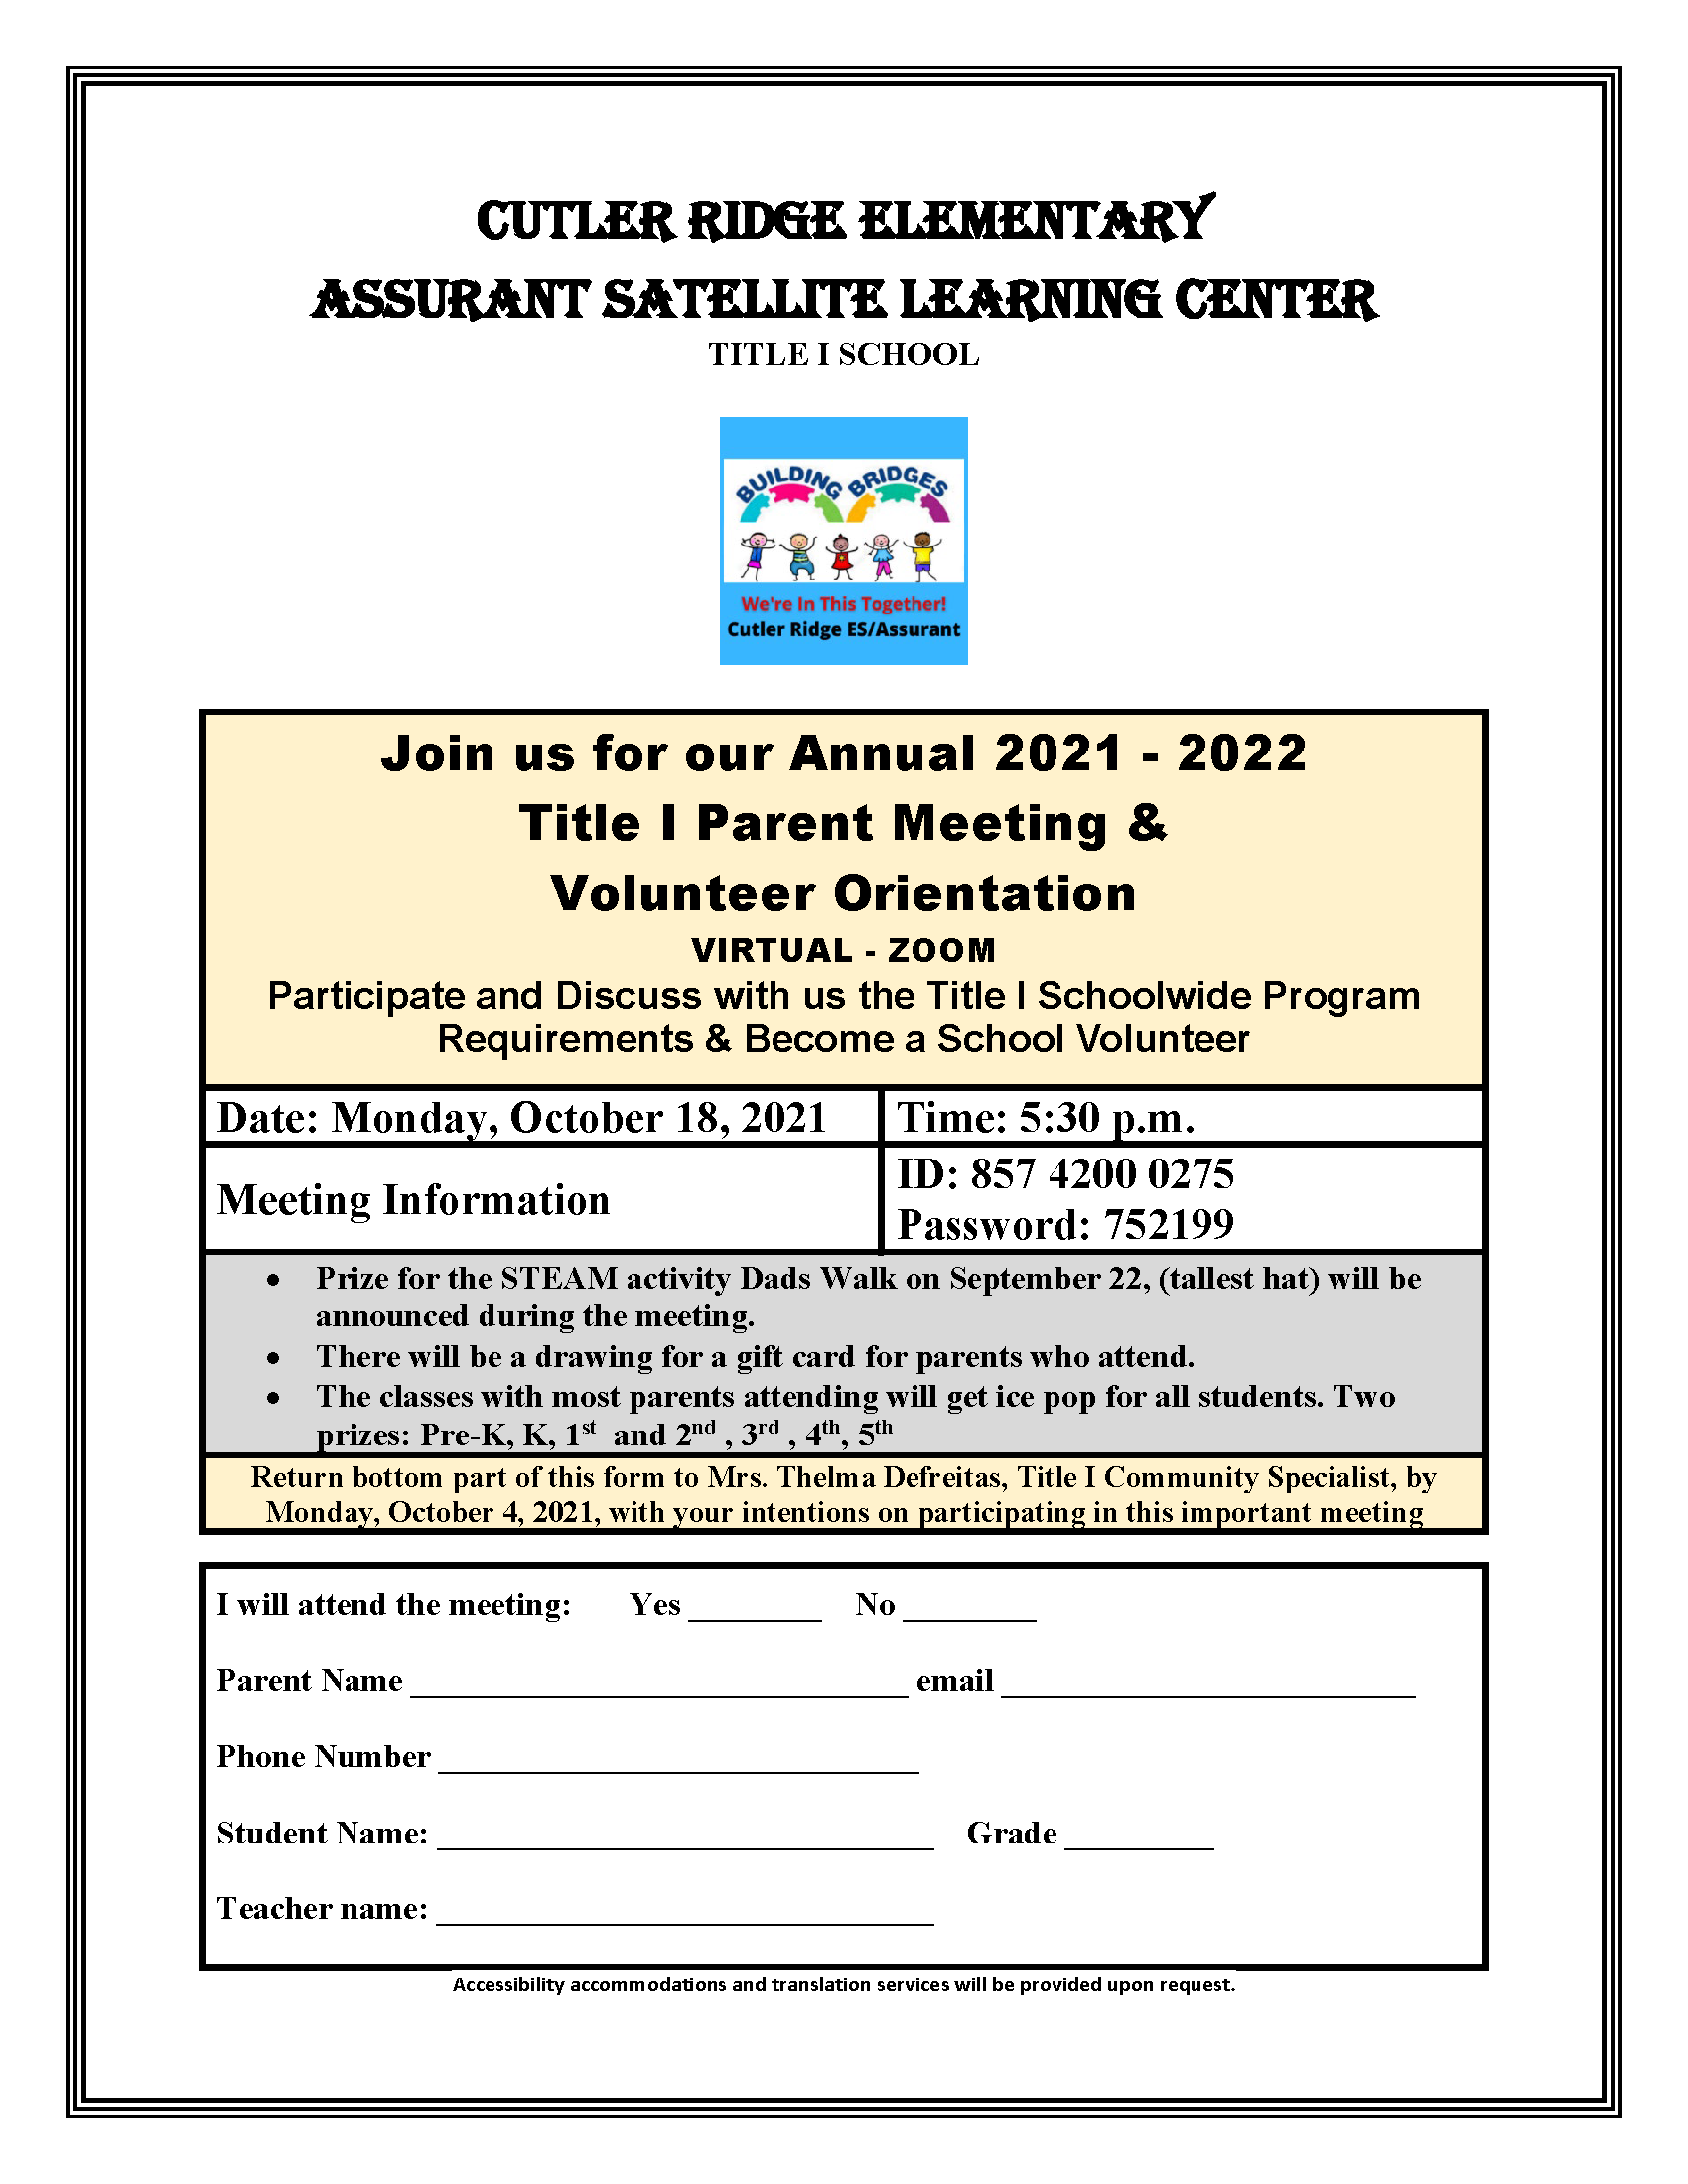 Title I Parent Meeting and Volunteer Orientation